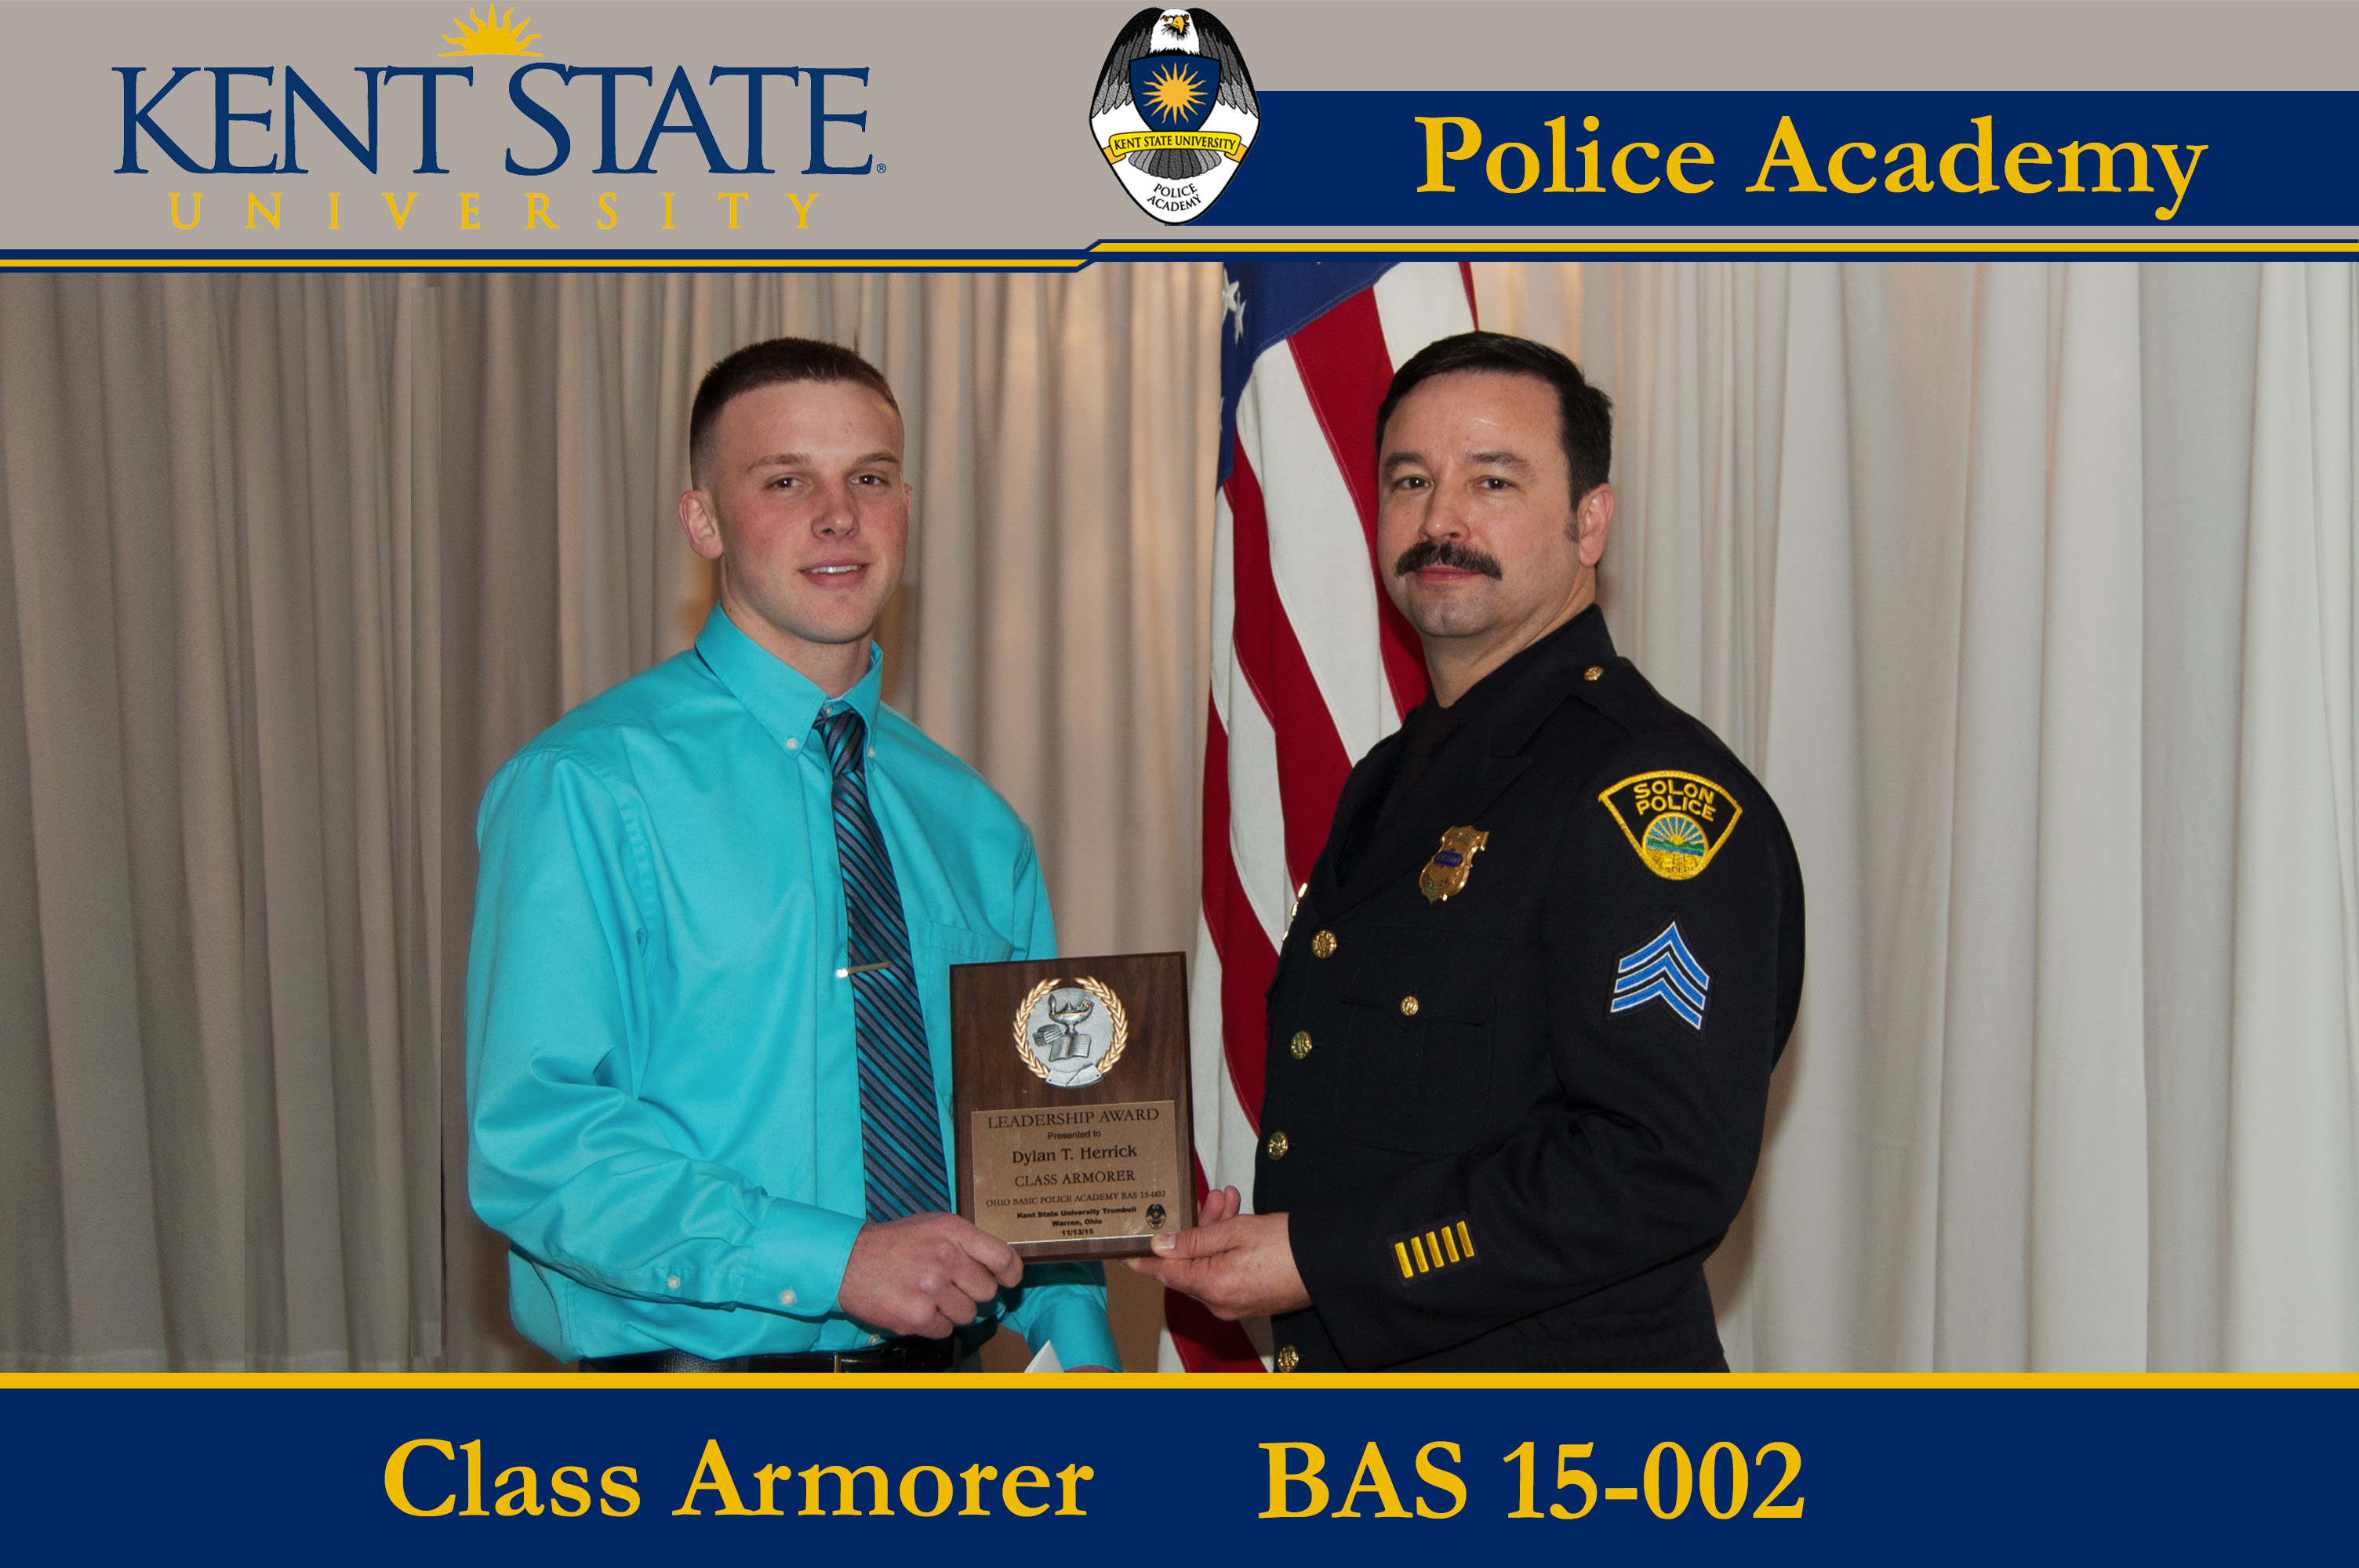 Class Armorer Pictured Receiving Award